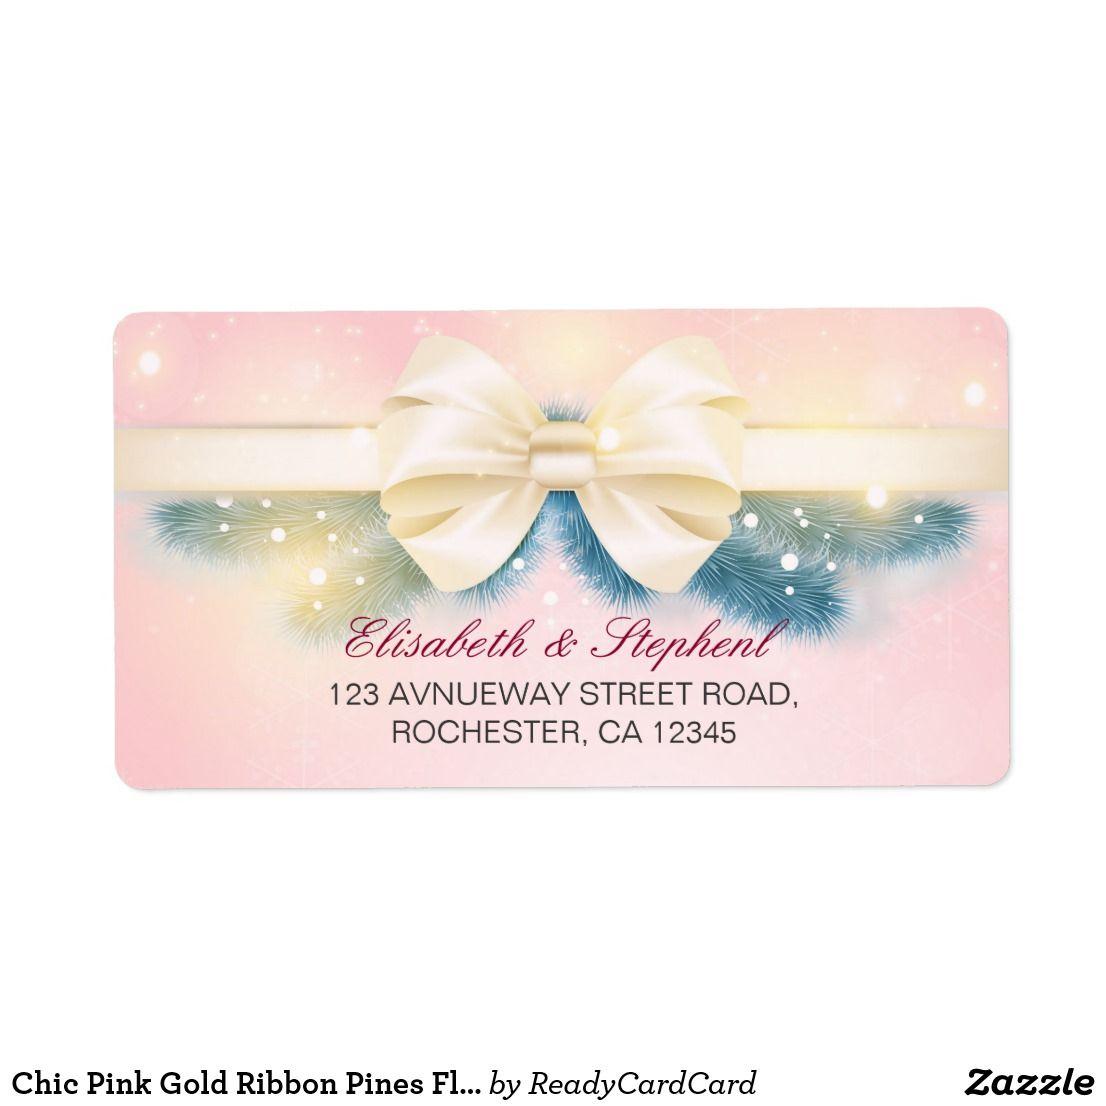 Chic Pink Gold Ribbon Pines Fl Wedding Address Label Elegant Vintage Modern And